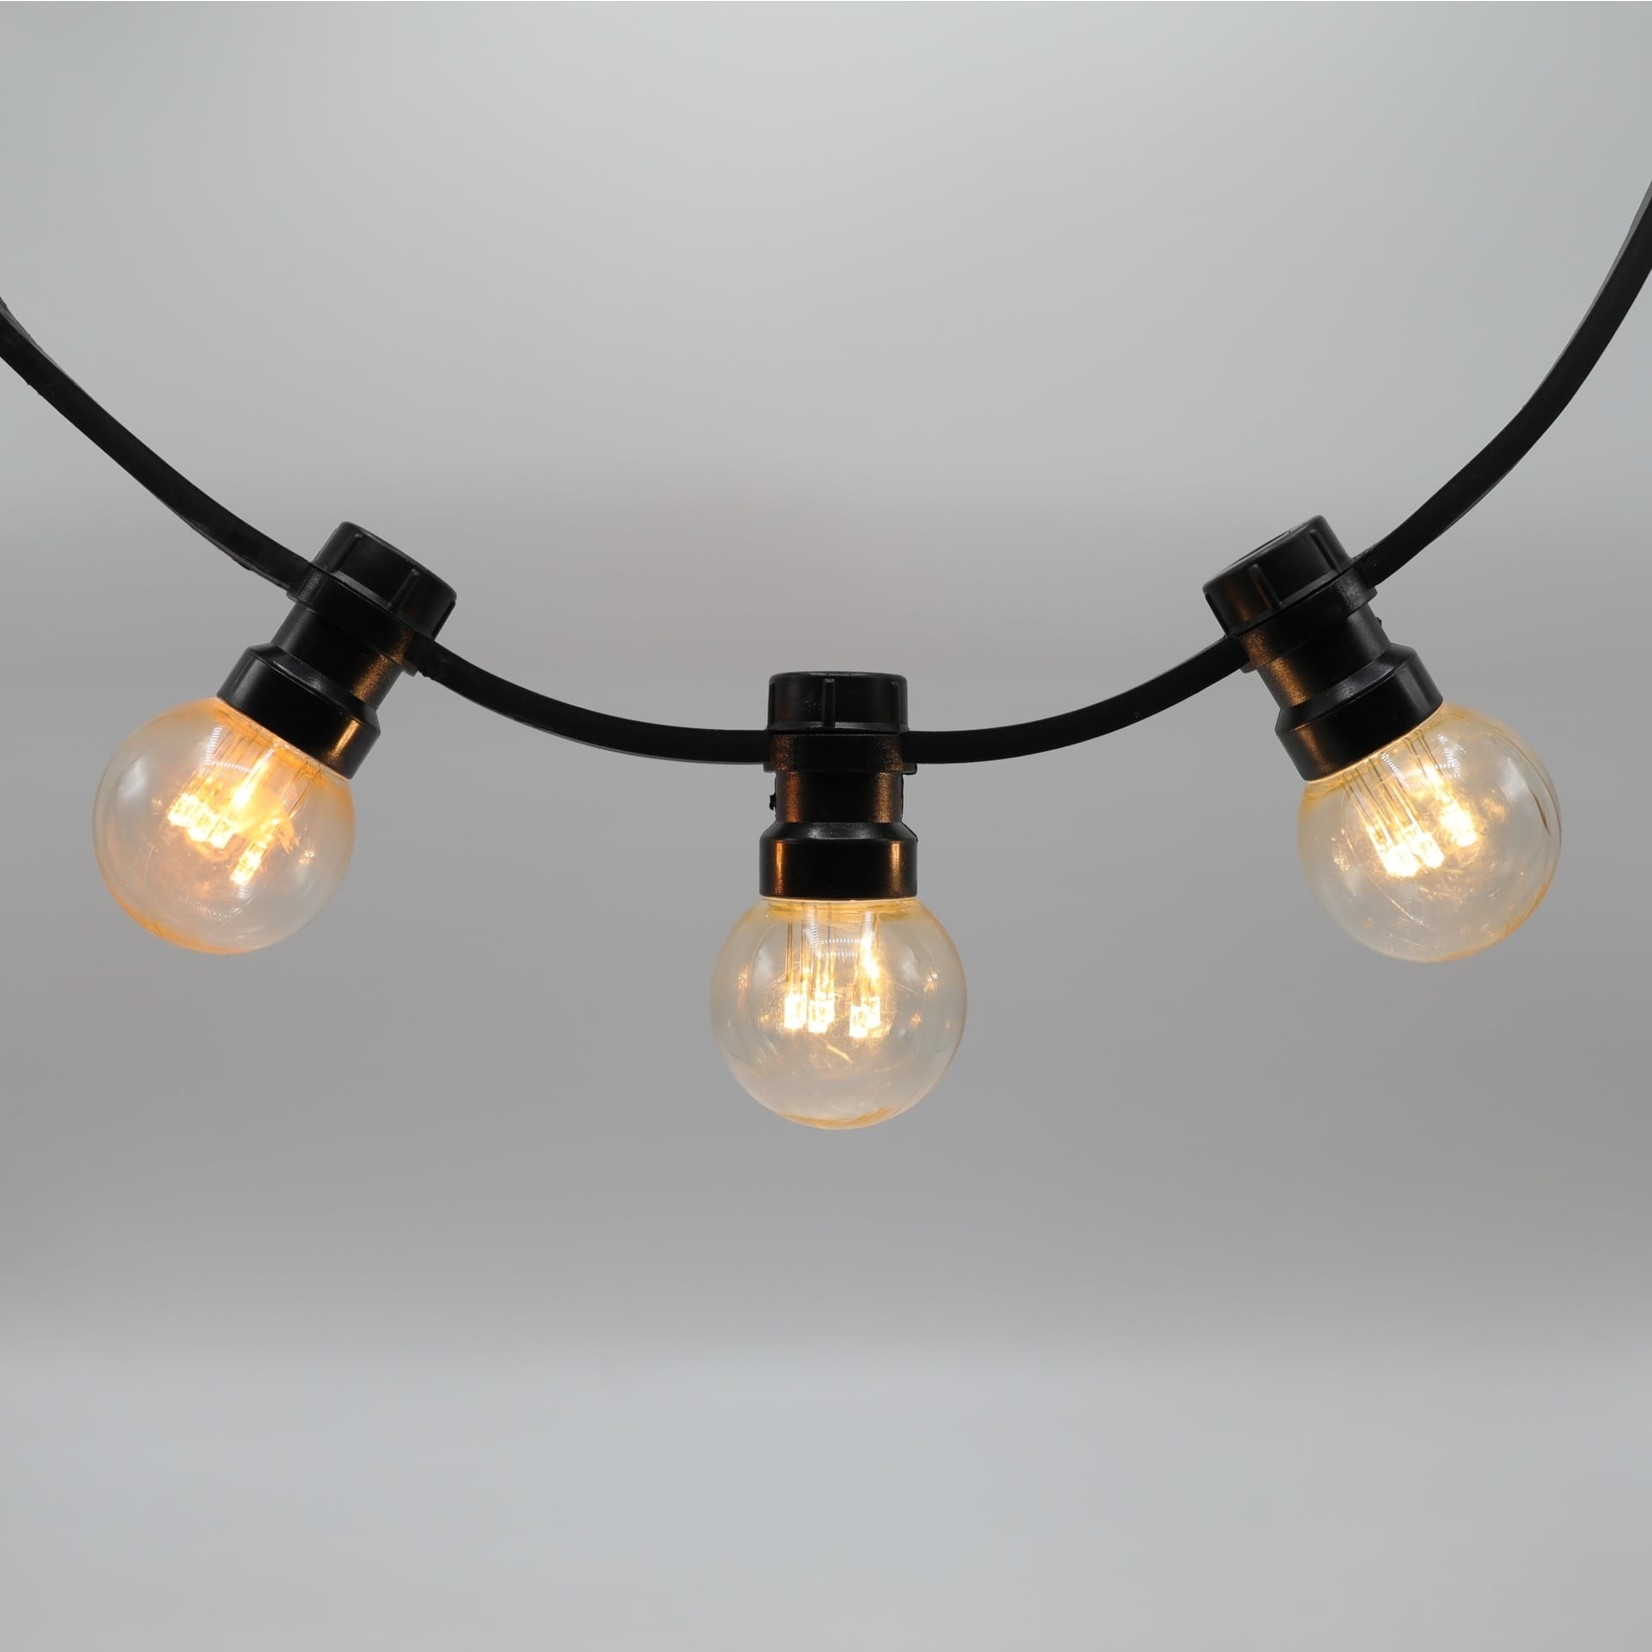 prik-ledlamp-warm-wit-op-stokjes IP65